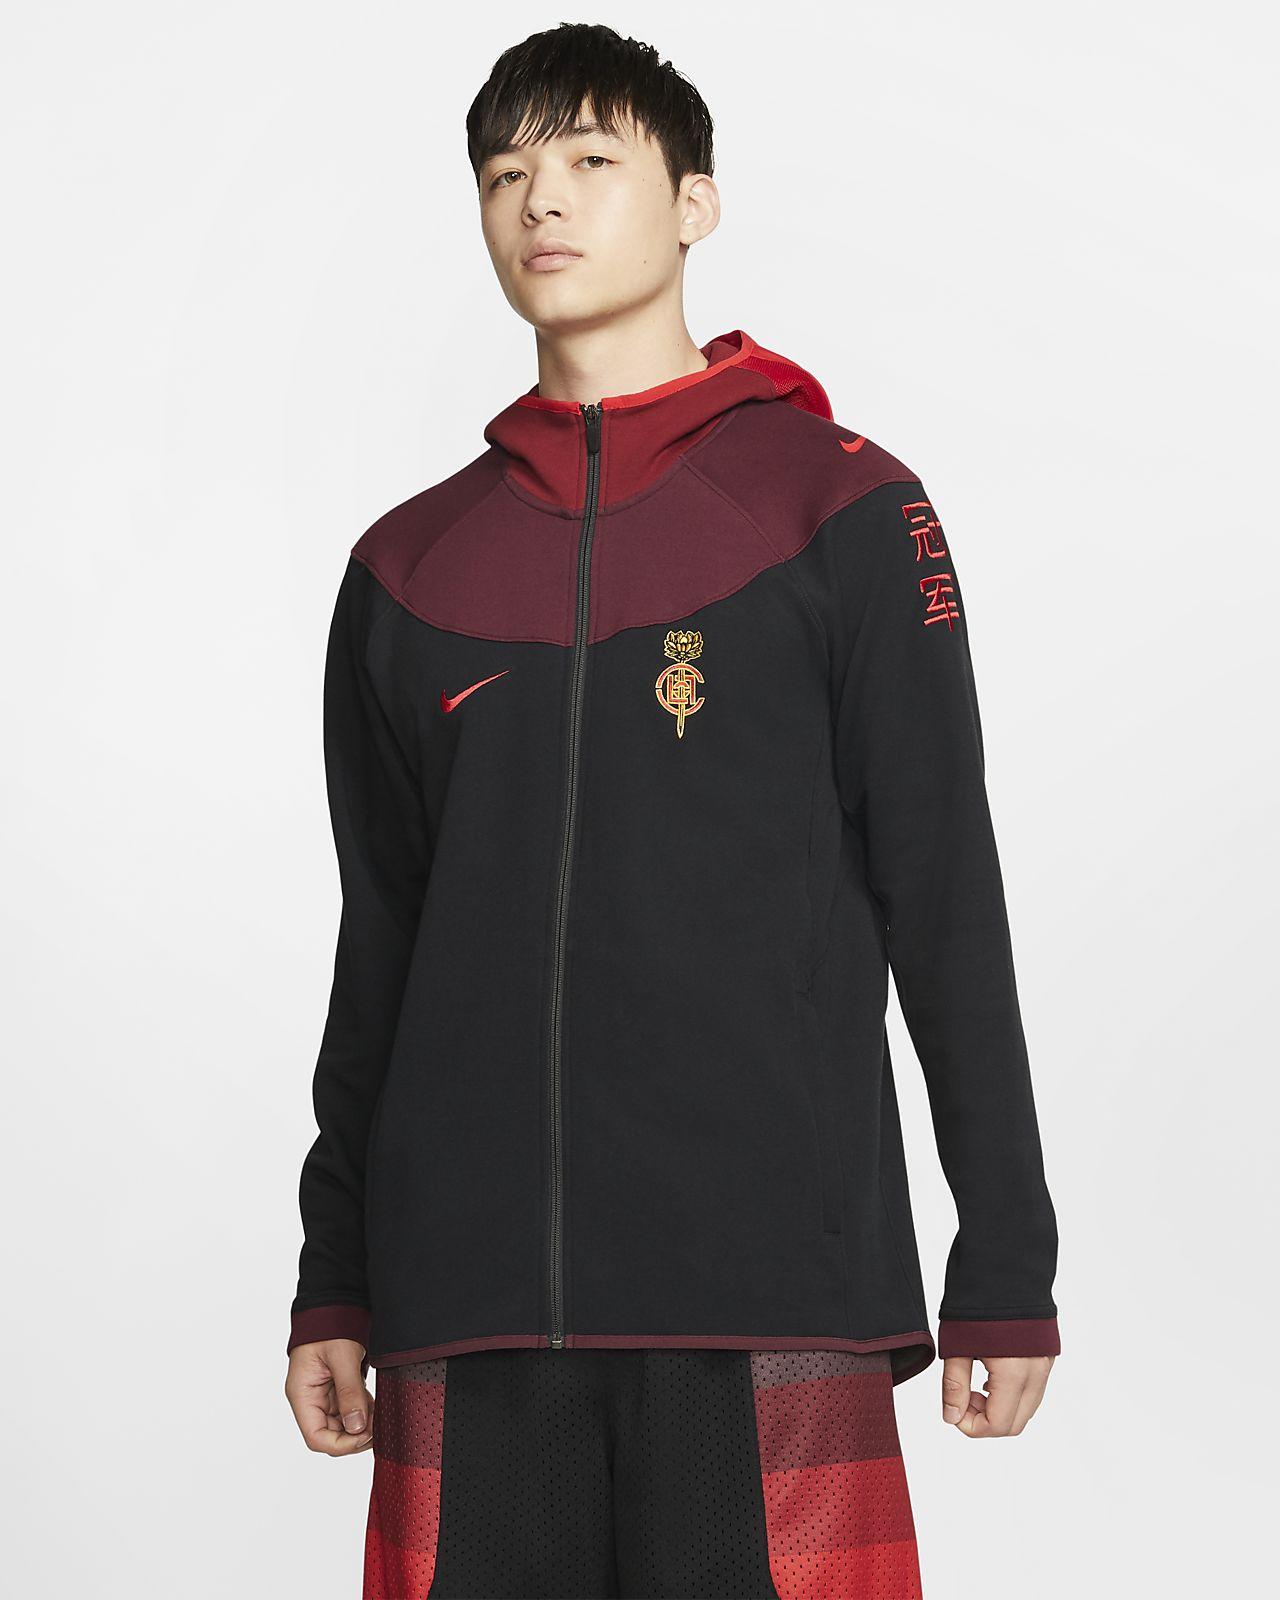 Nike x CLOT Men's Hoodie